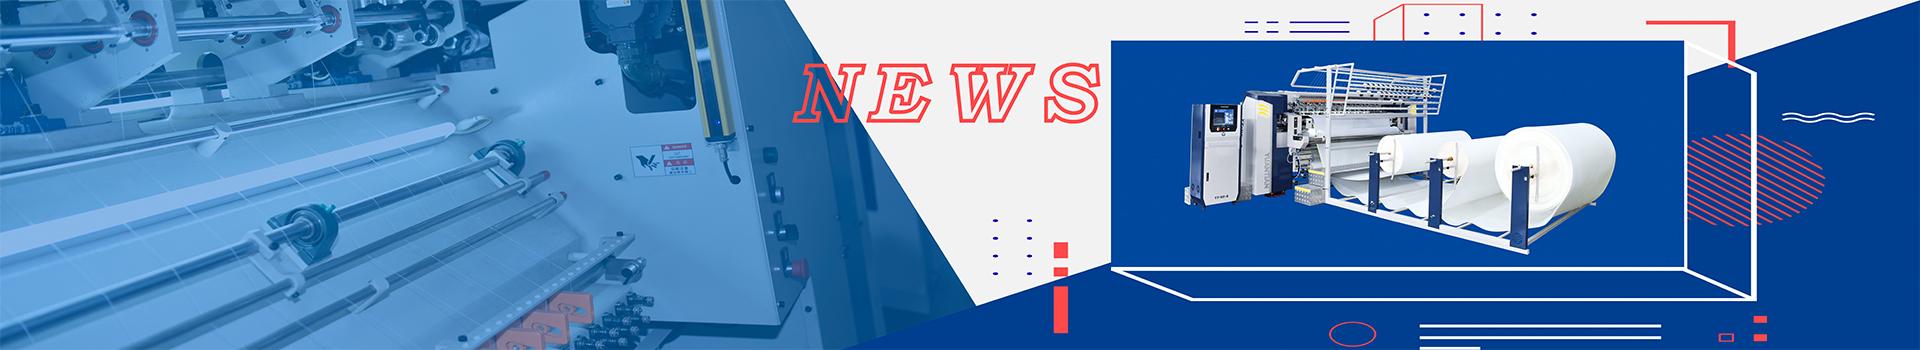 The Mattress Machinery News by Yuantian